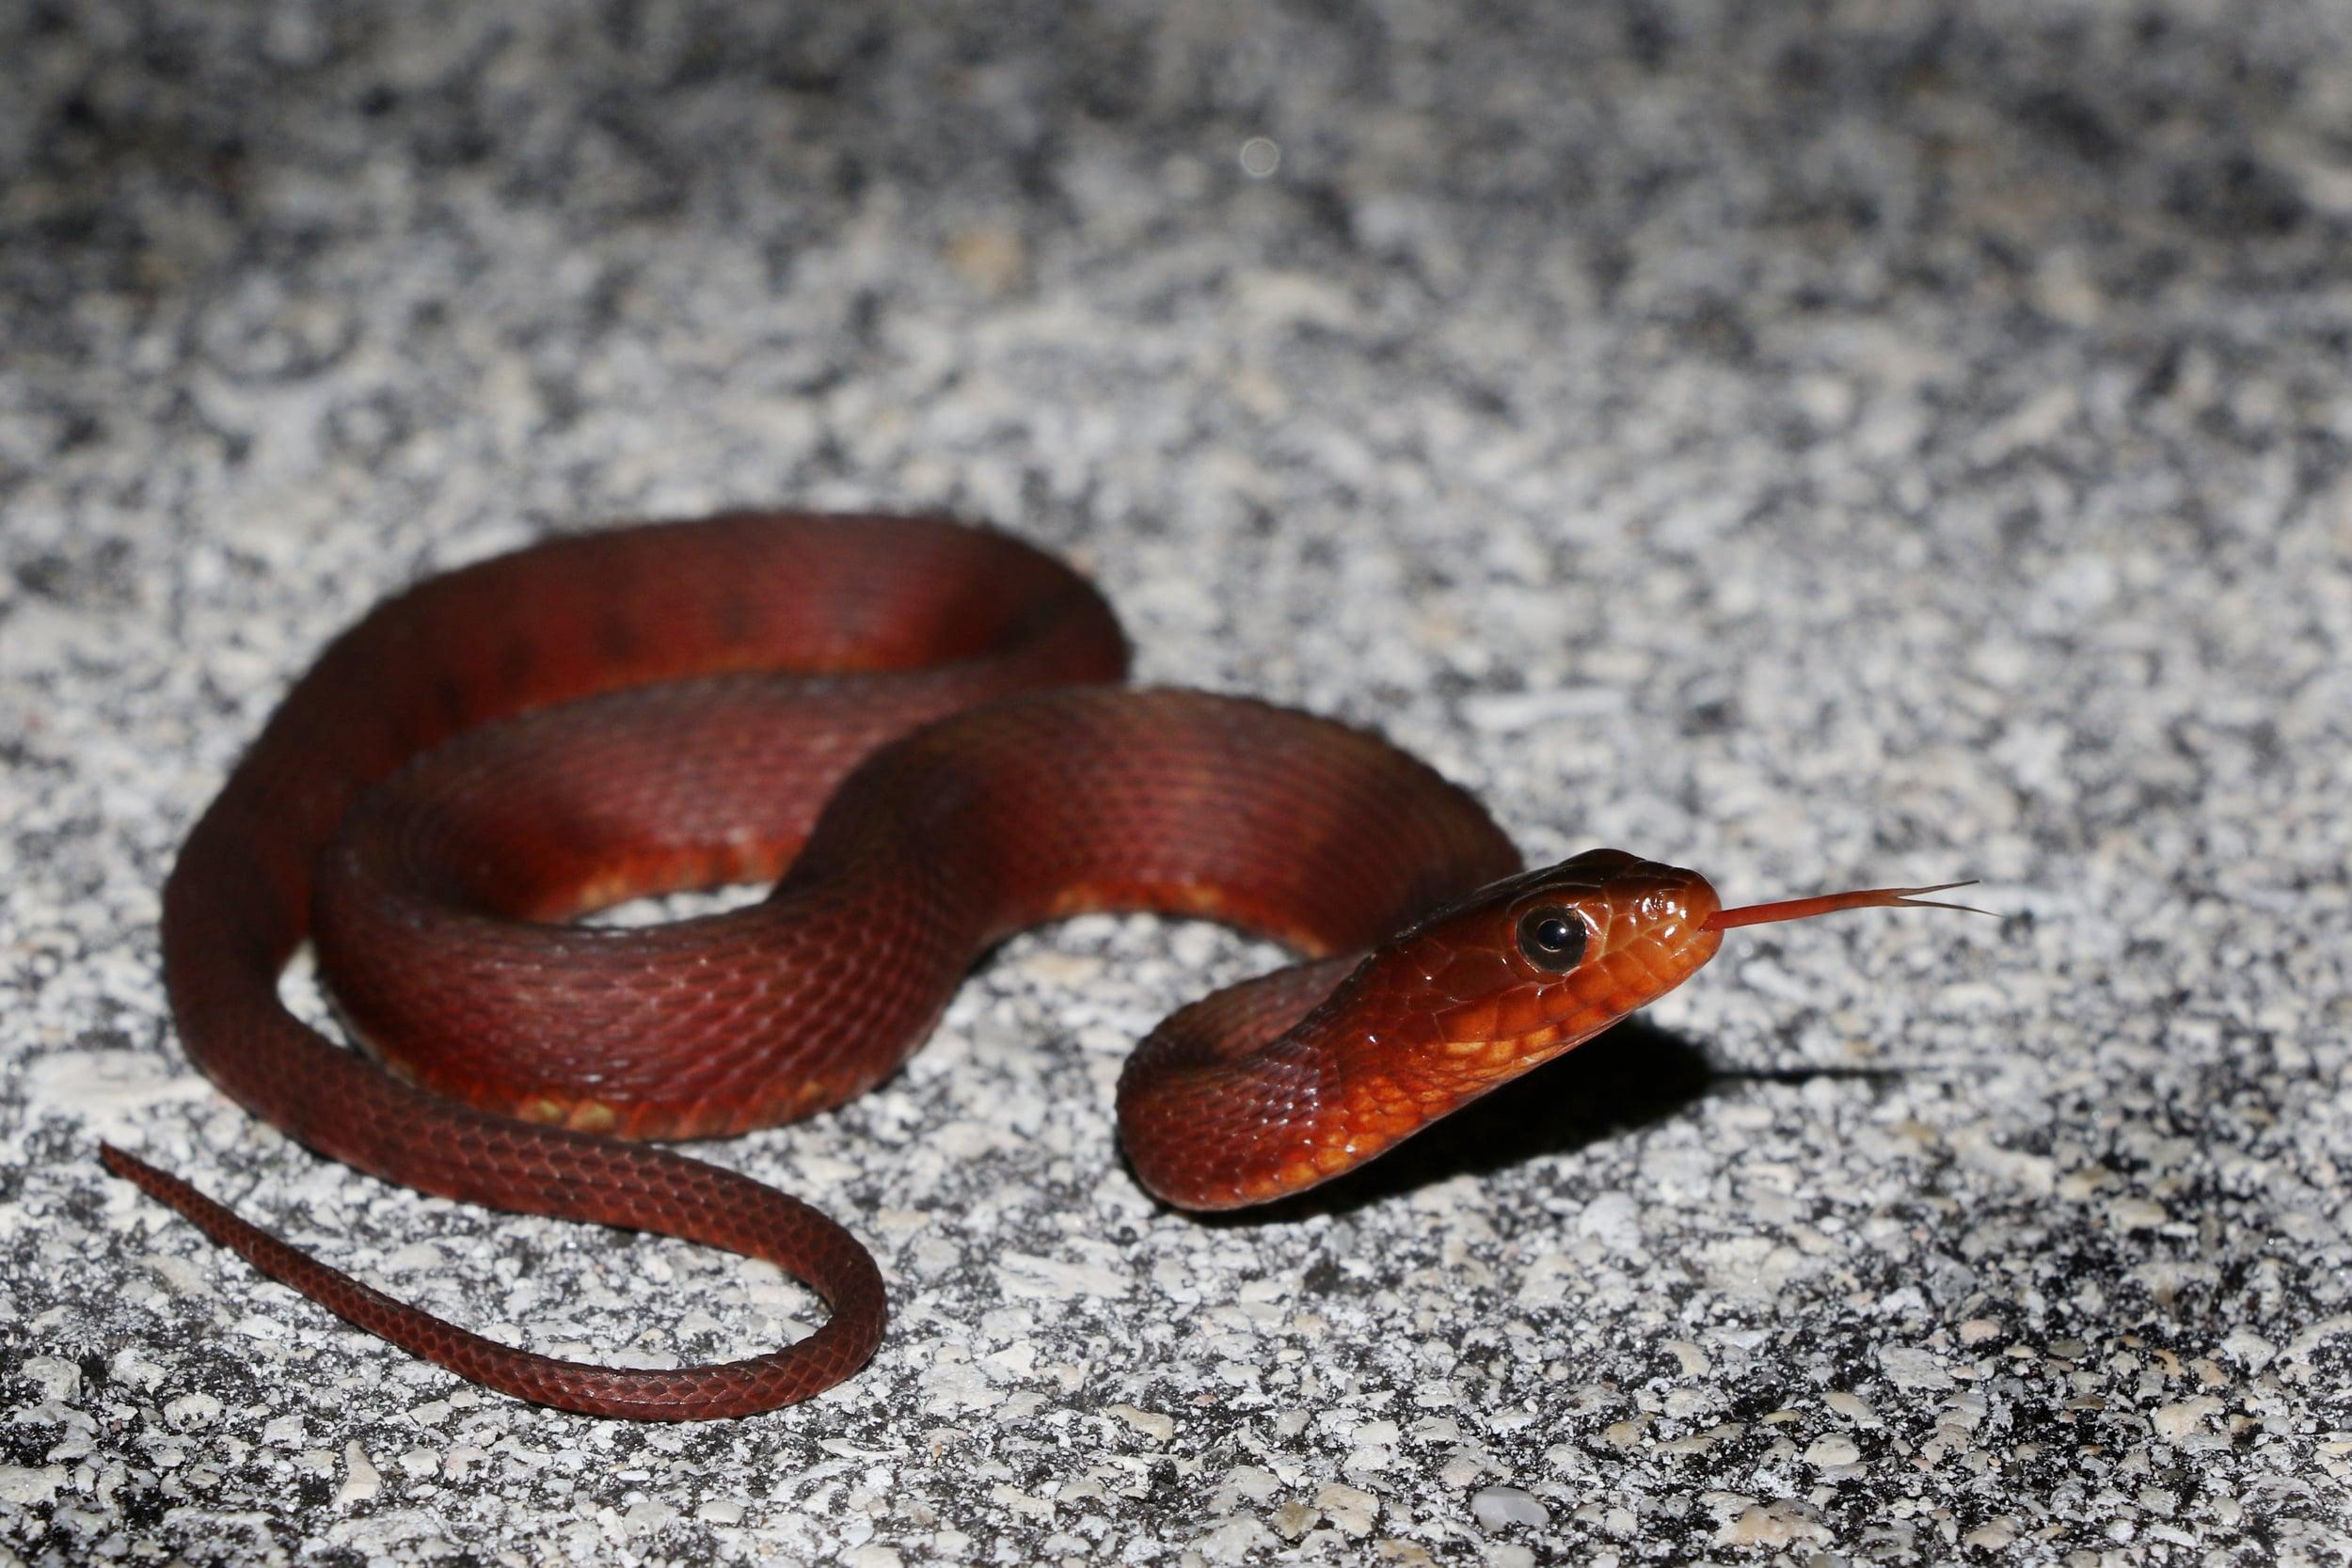 Mangrove Saltmarsh Snake - These can variable and stunning.